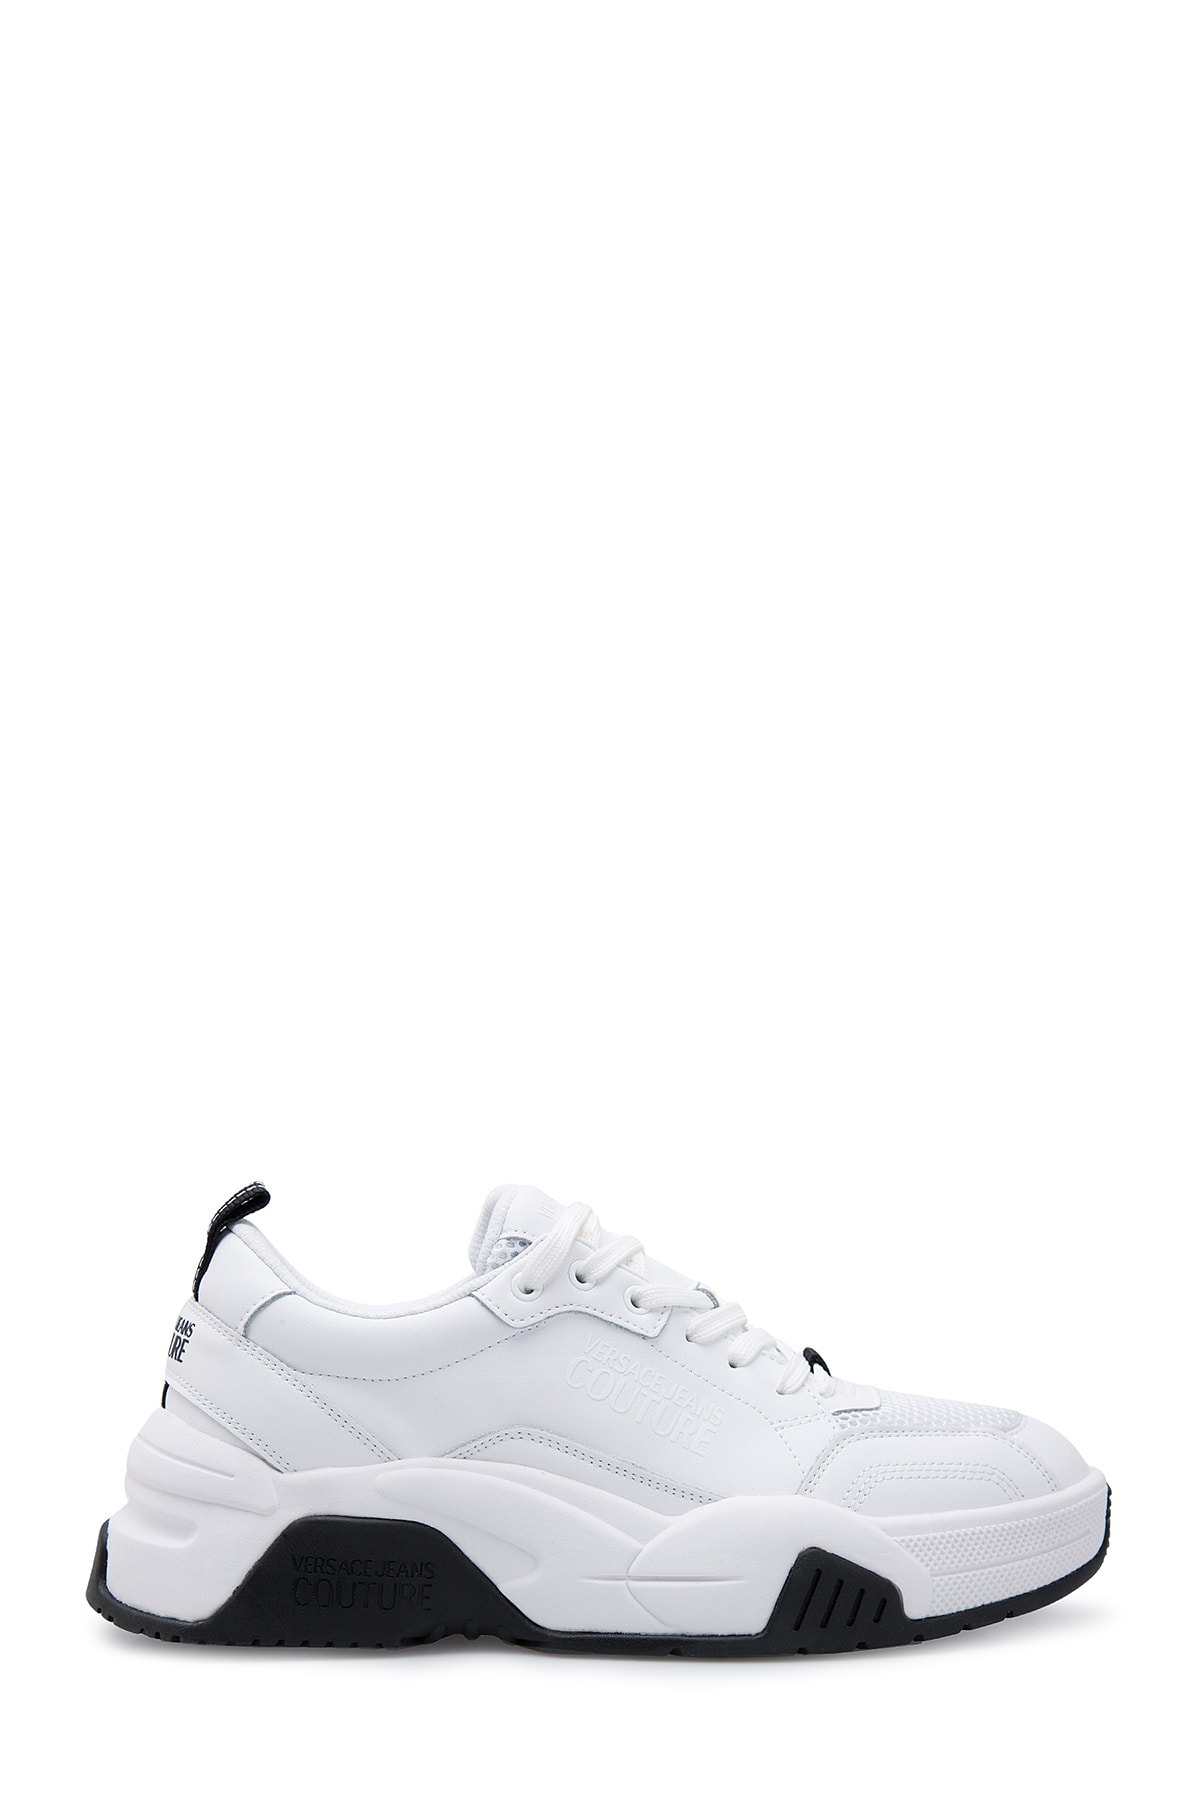 VERSACE JEANS COUTURE Erkek Beyaz Casual  Ayakkabı E0yvbsf6 71542 003 1